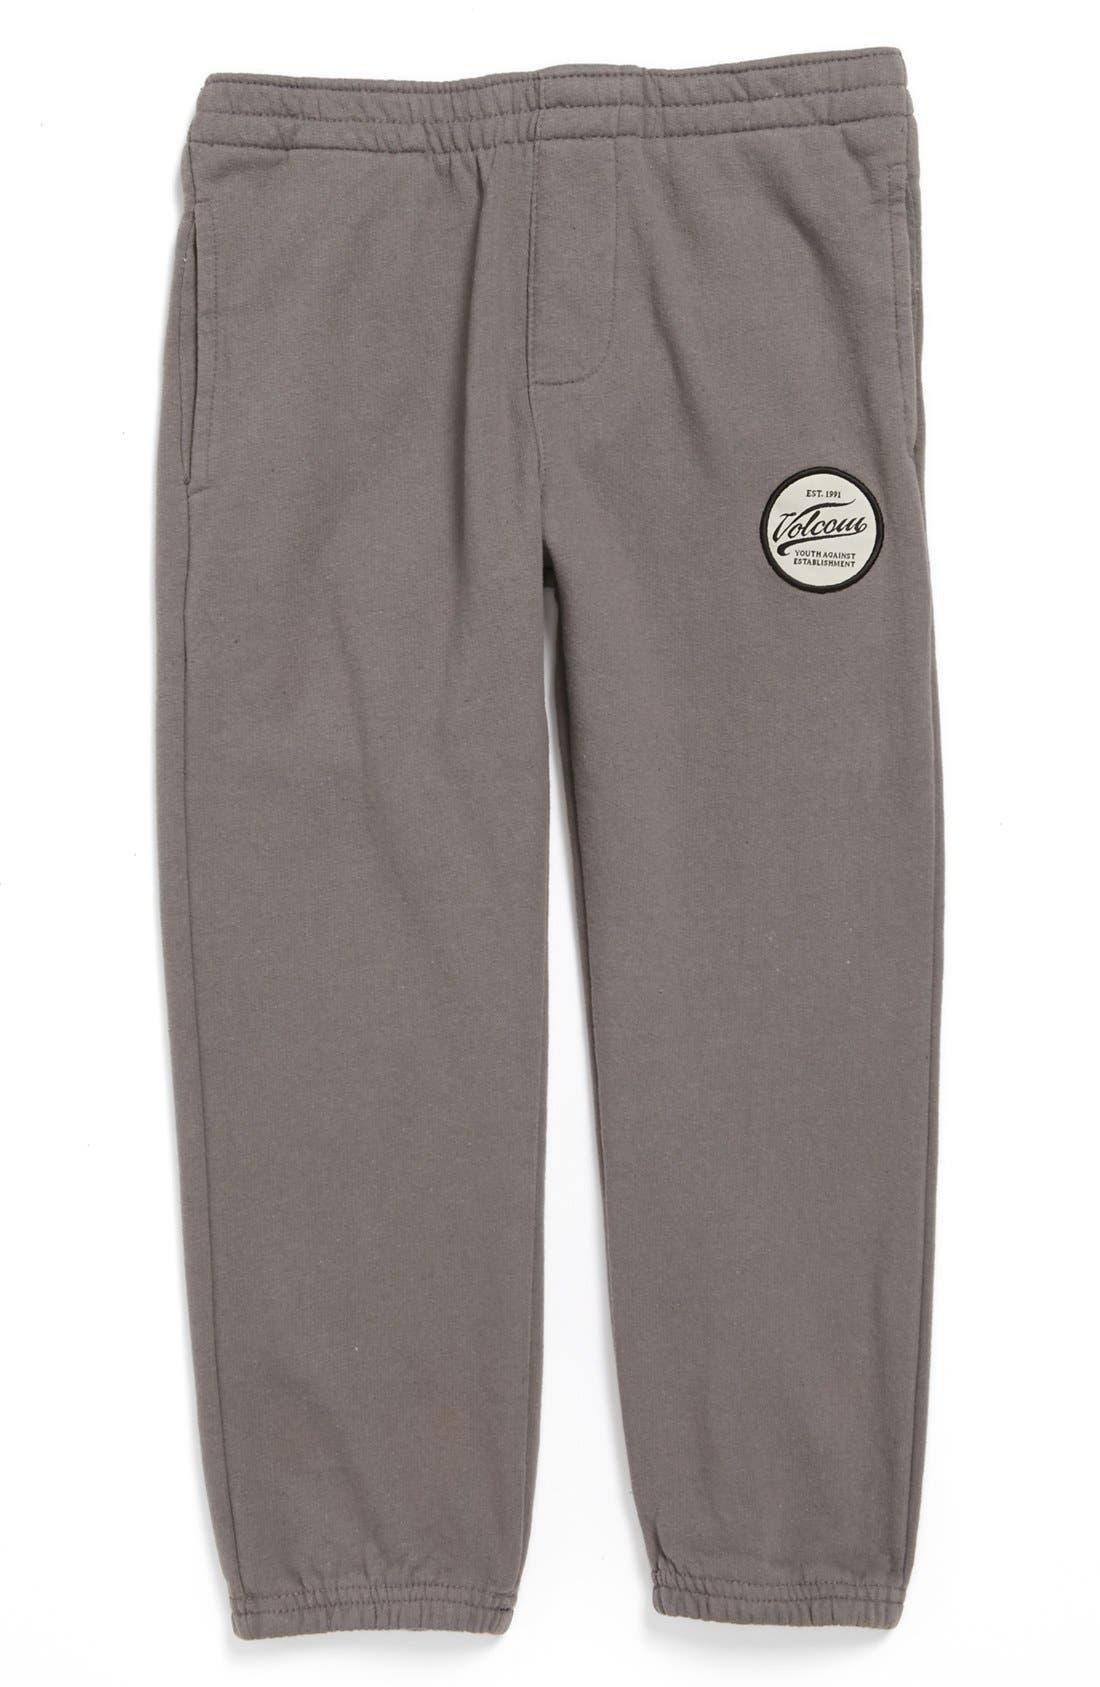 Main Image - Volcom 'Programer' Fleece Lined Sweatpants (Little Boys)